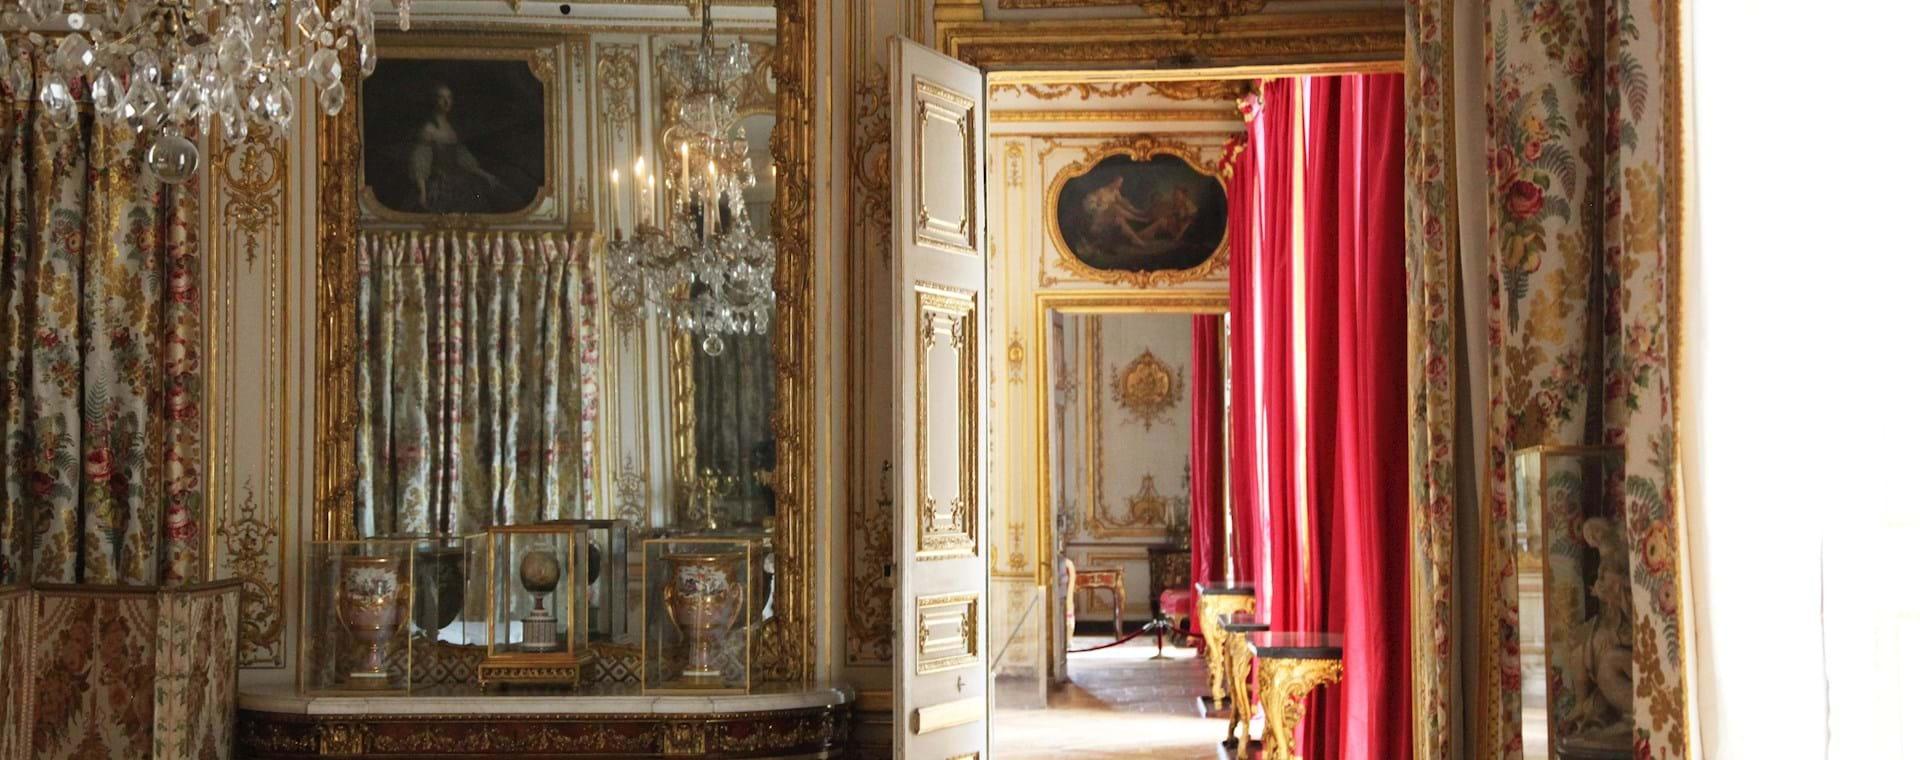 Versailles Palace Interior Corridor